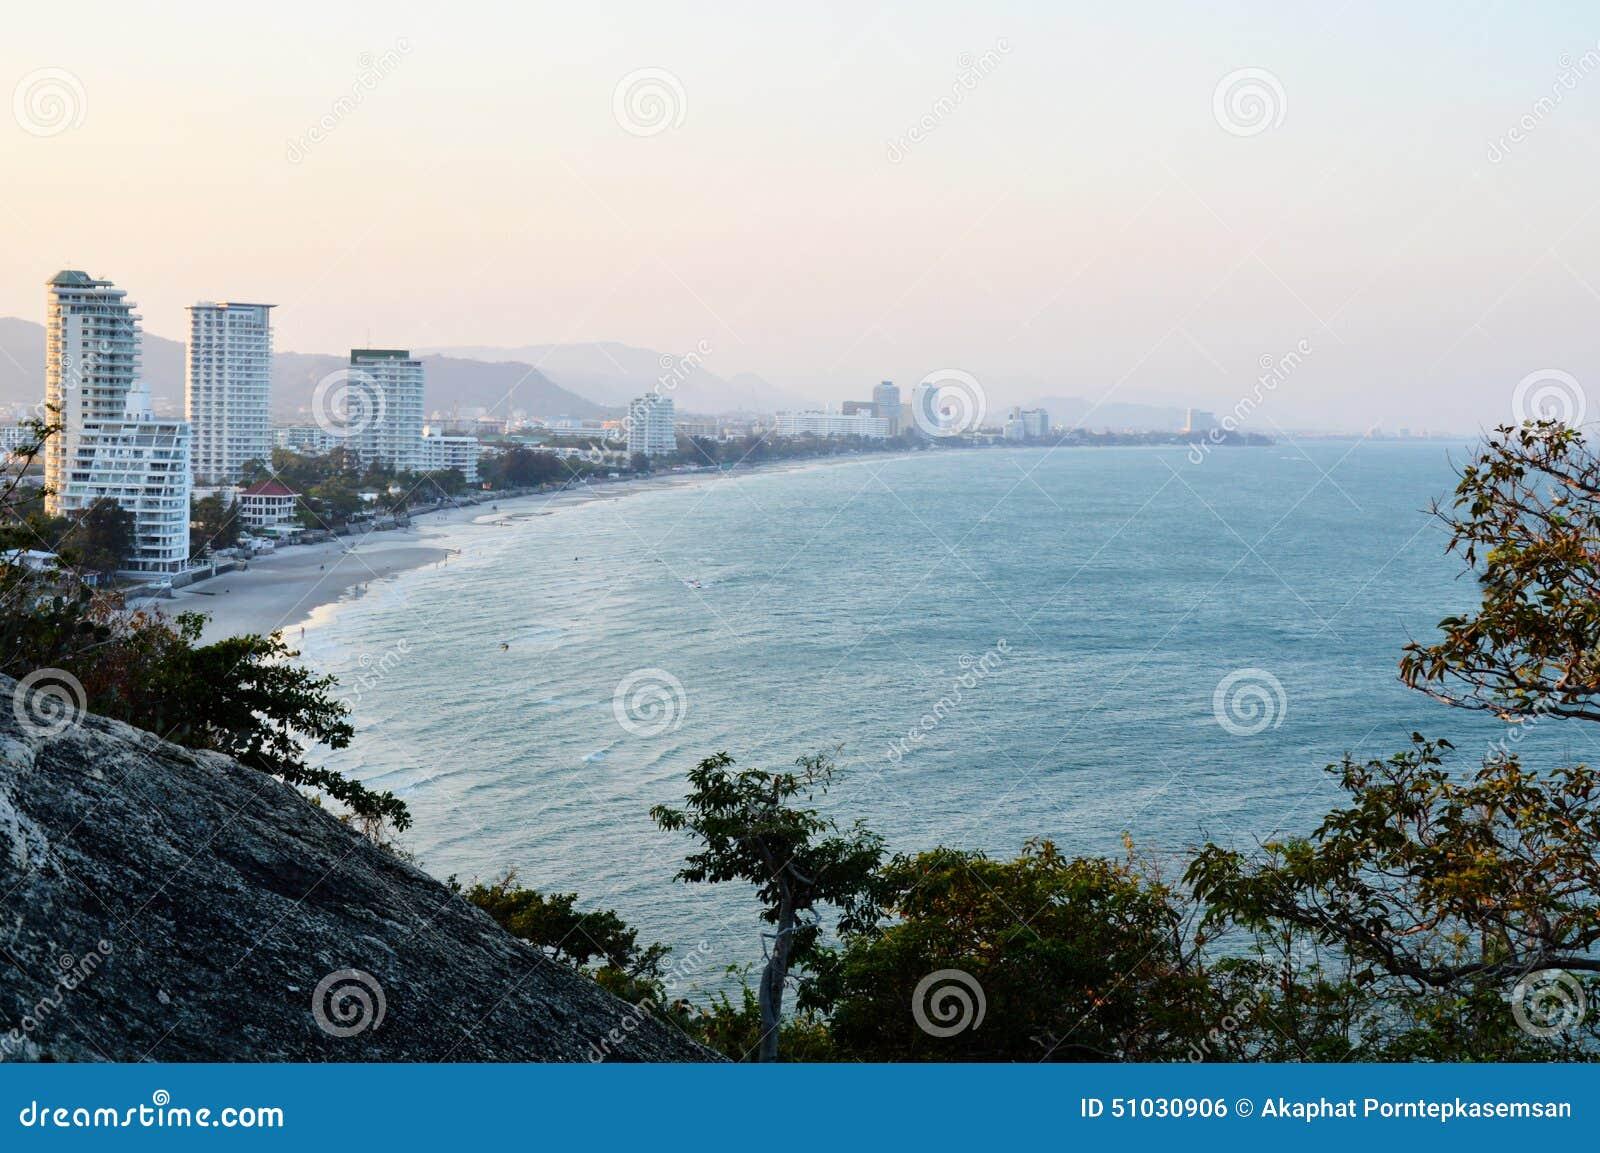 Curve beach landscape